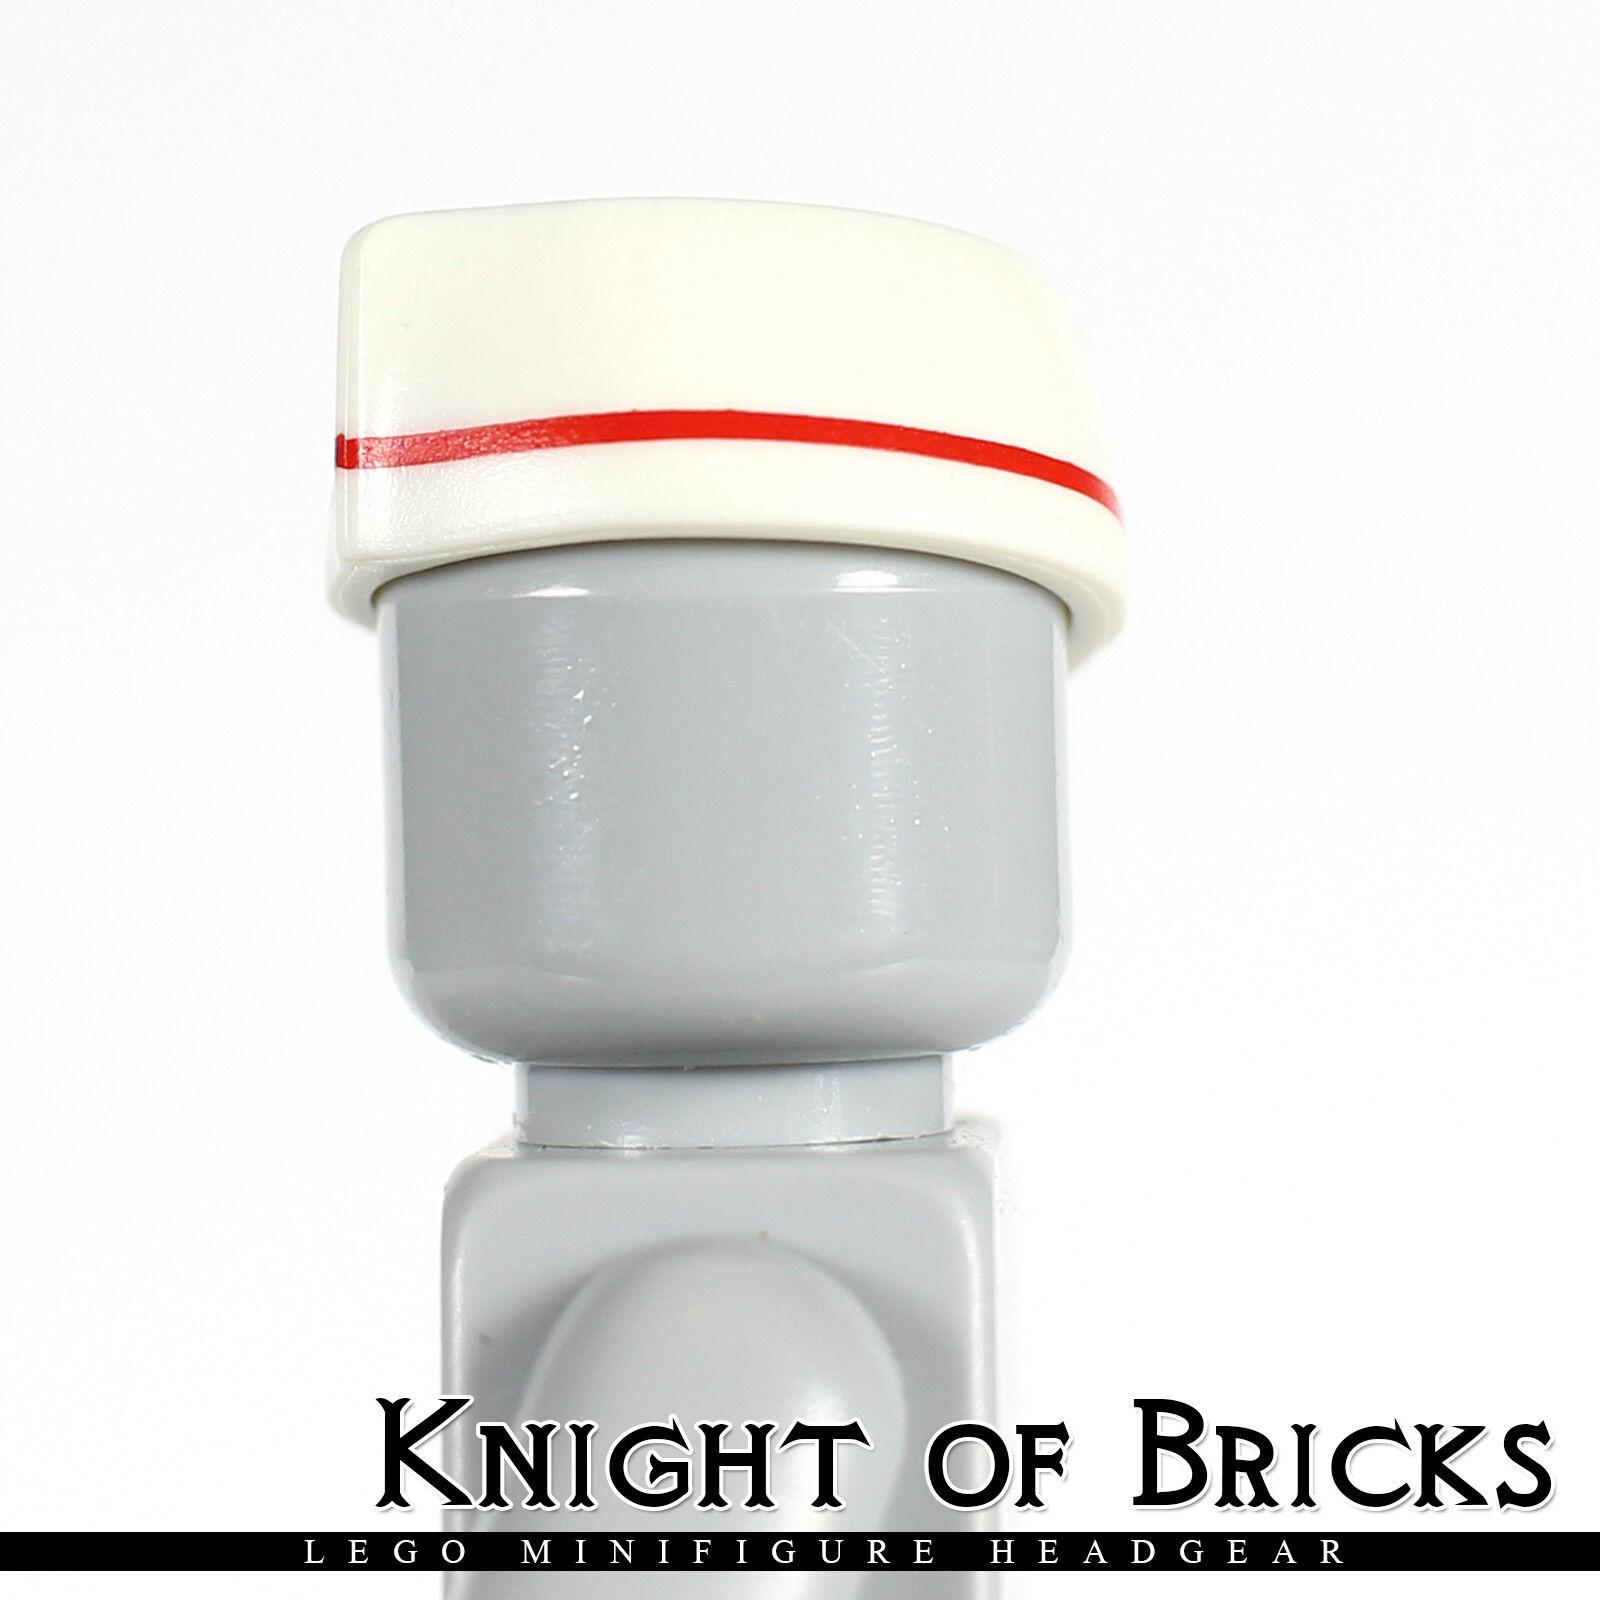 Lego 20 New White Minifigure Headgear Caps  Butcher Food Service Pieces